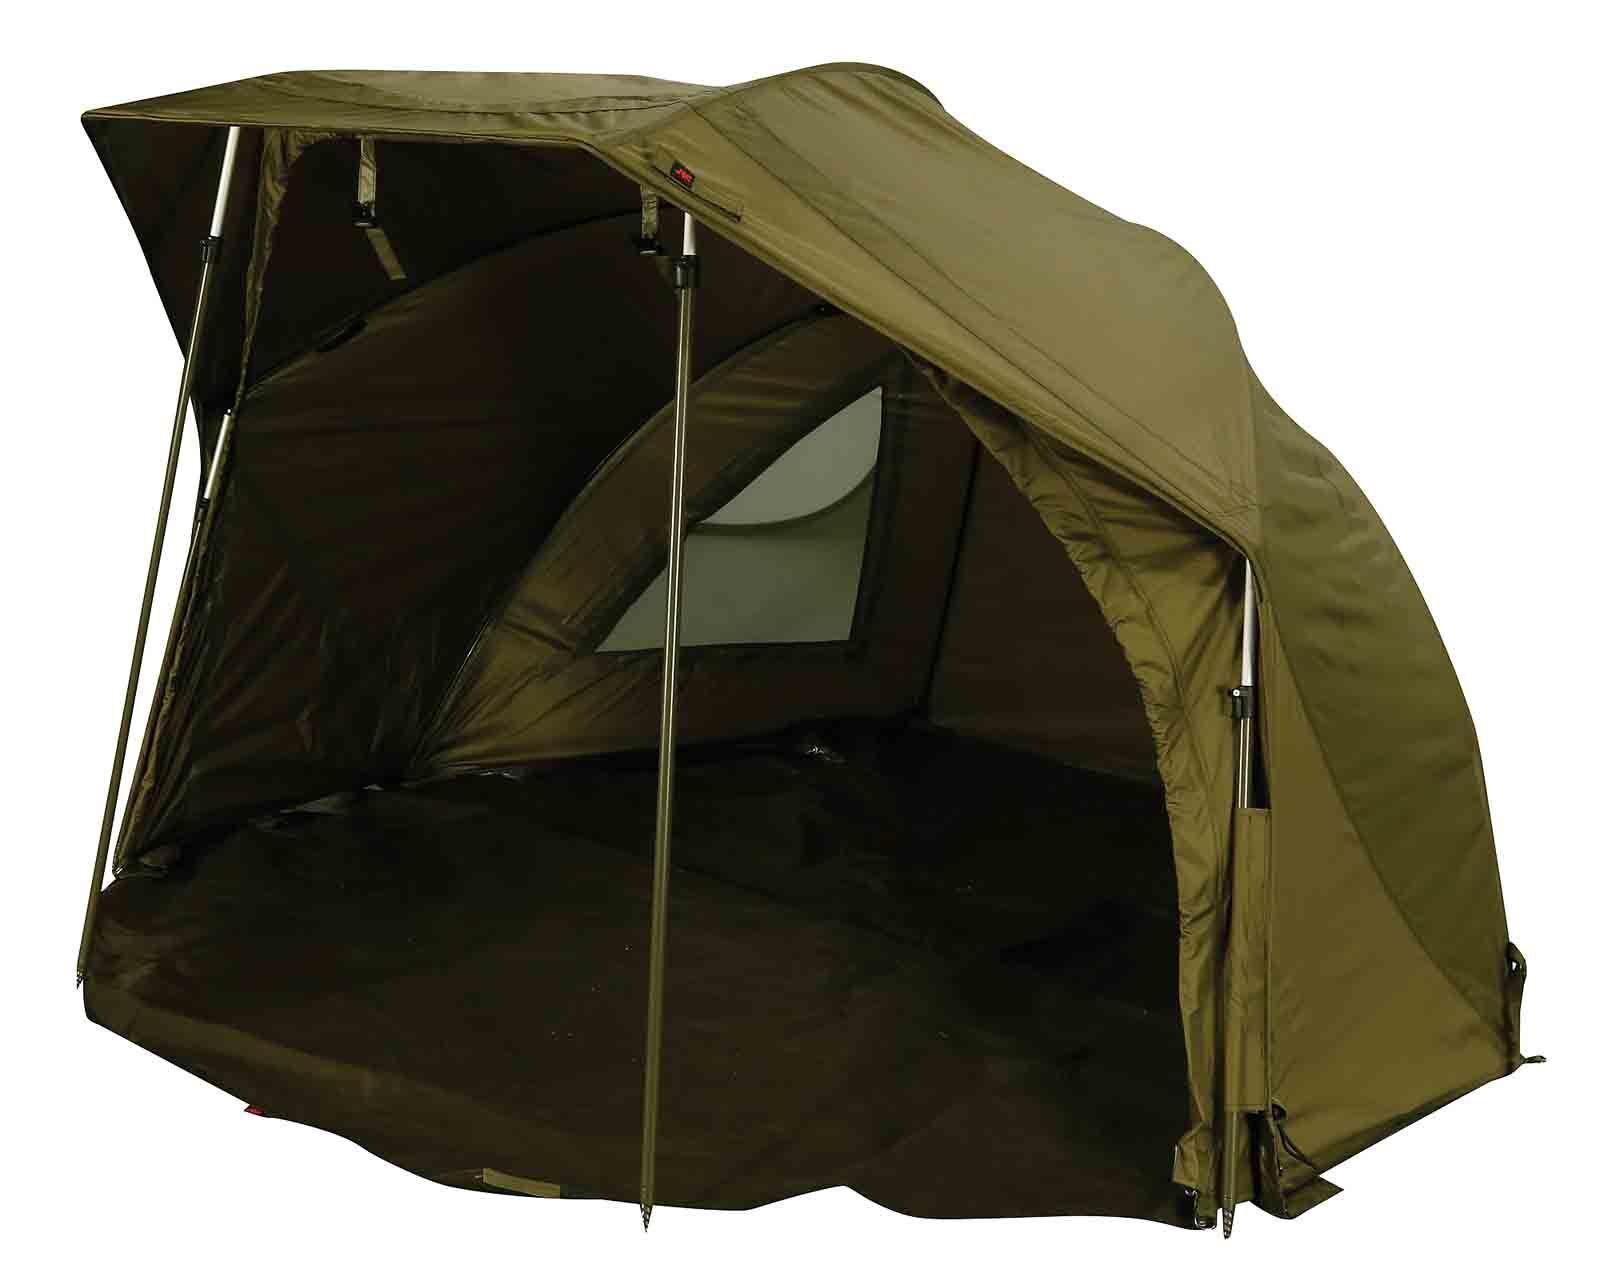 JRC New Stealth 2G Classic Brolly System   Carp Fishing Bivvy Umbrella Shelter